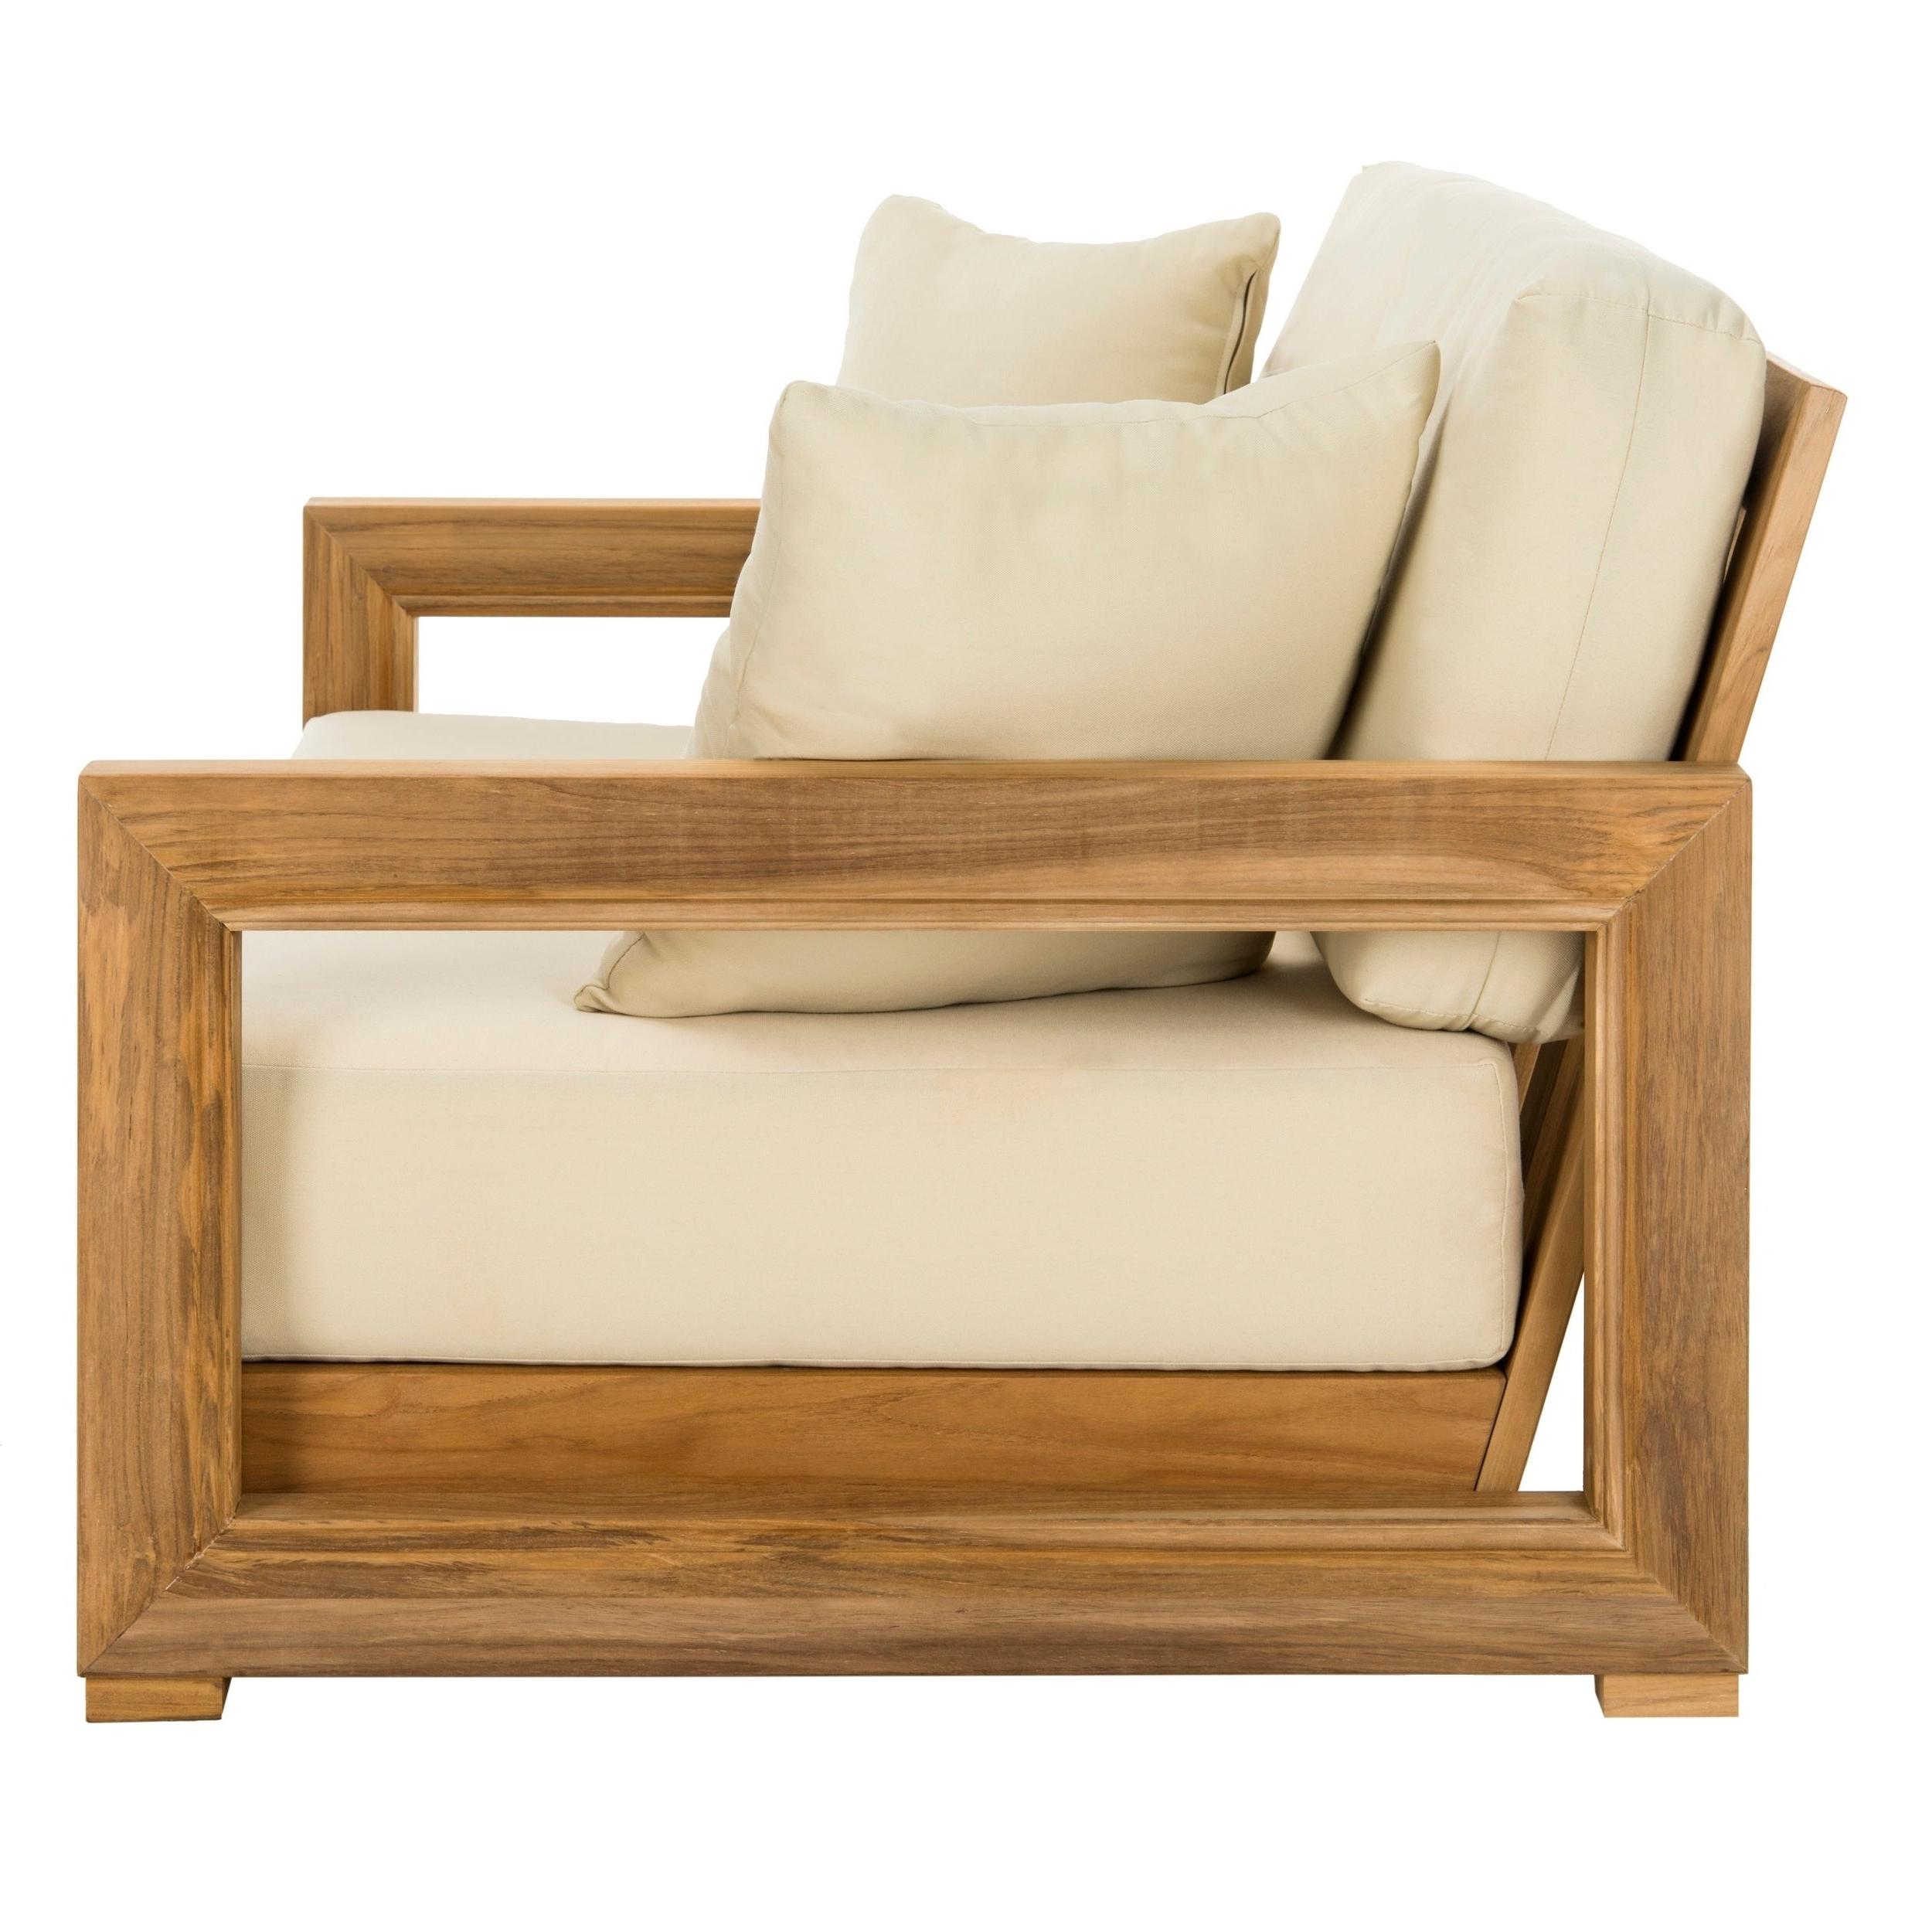 Montford Teak Loveseats With Cushions Regarding Most Current Safavieh Couture Outdoor Montford Teak Brown/ Beige 2 Seat Commercial Grade  Loveseat (View 10 of 20)